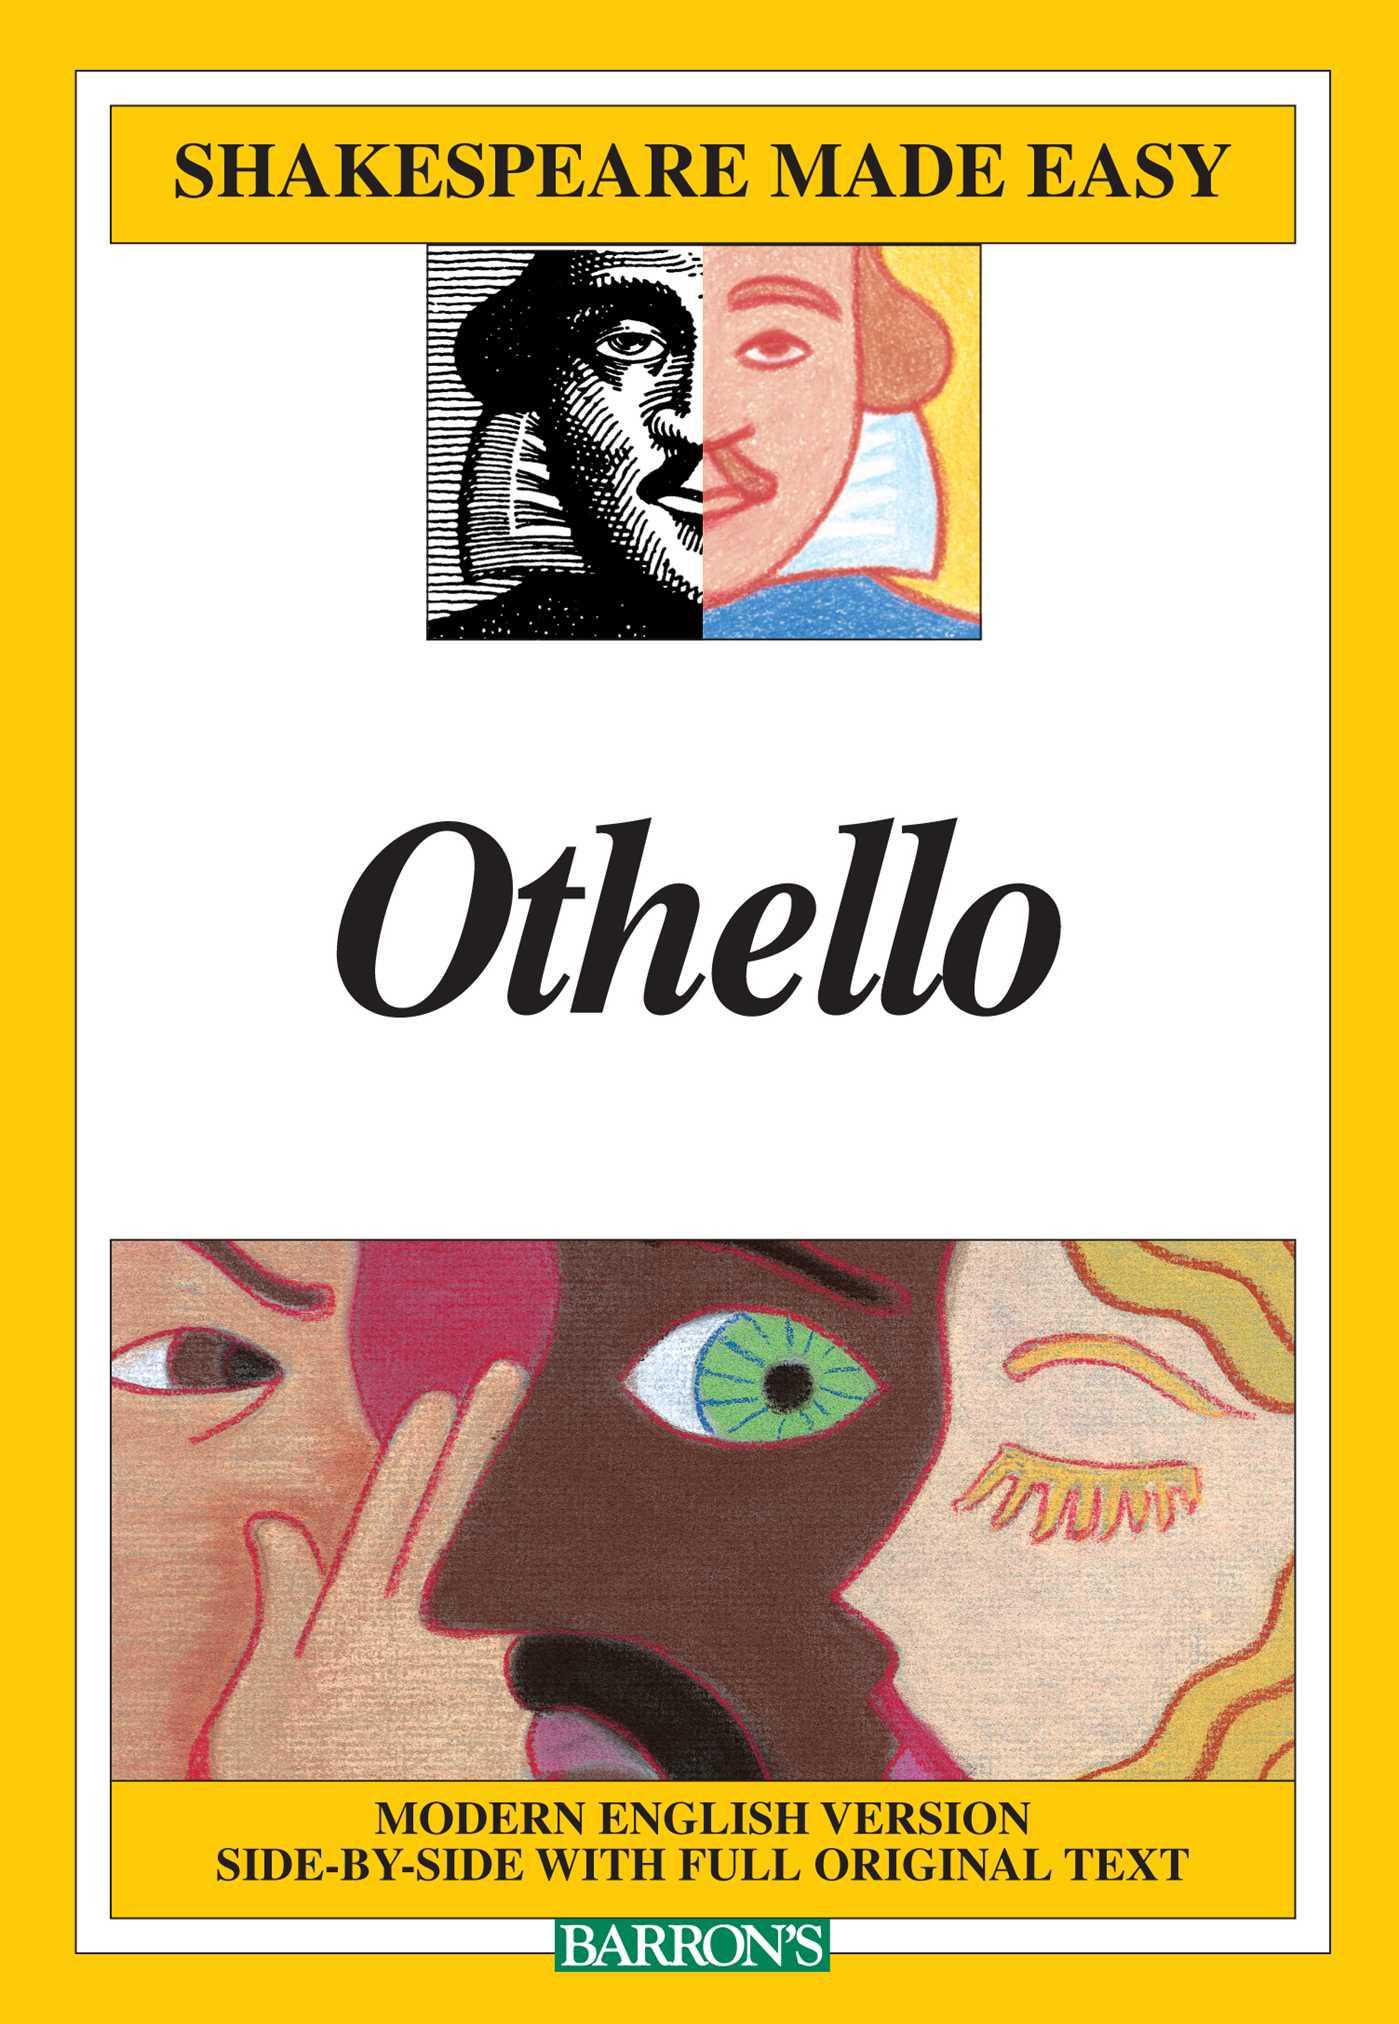 Book Cover Image (jpg): Othello (Shakespeare Made Easy)